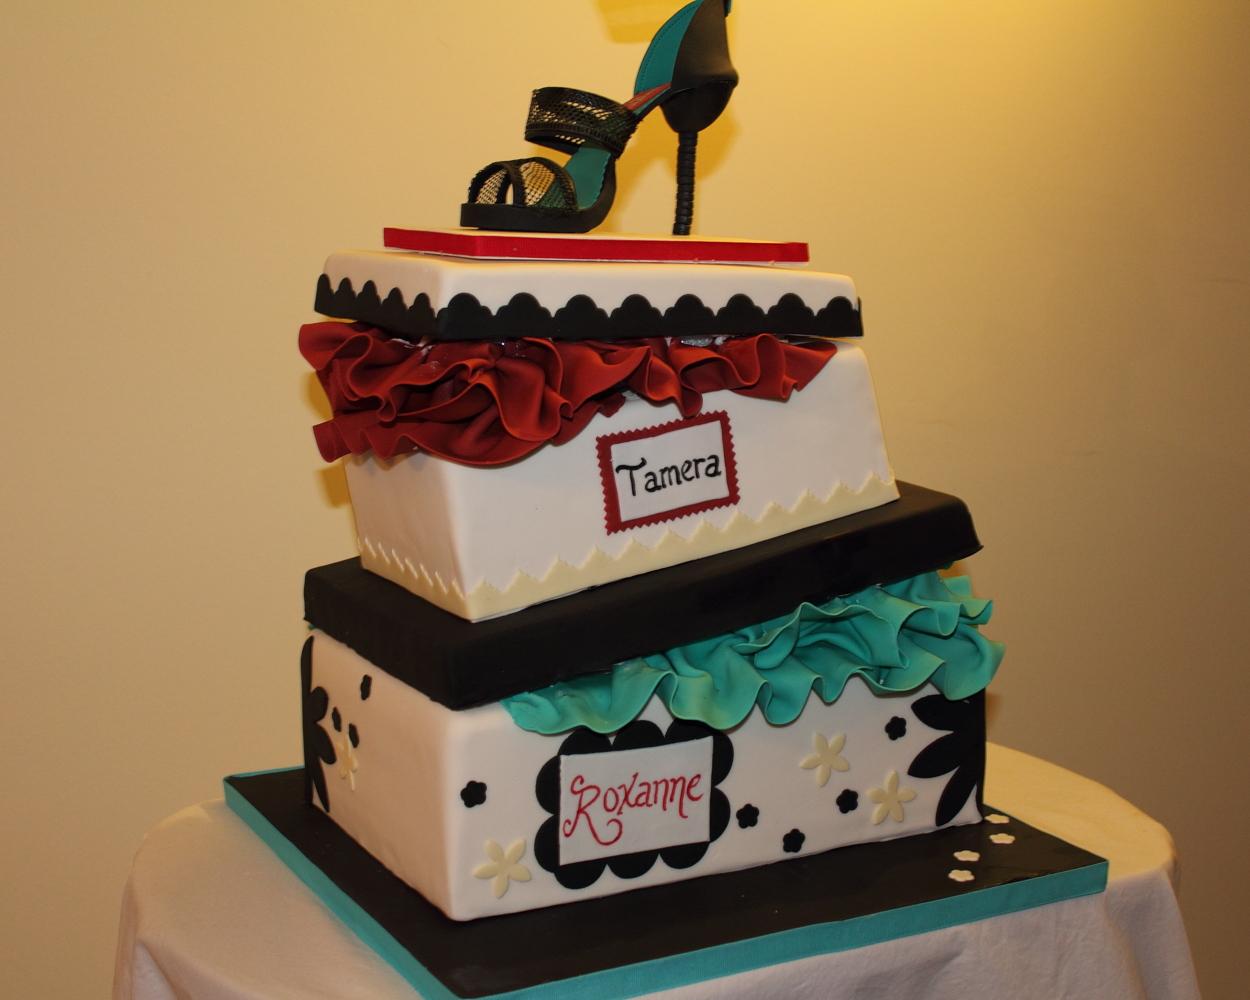 08a3b39d1ab2 The Cake Engineer  Birthday Shoebox Cake